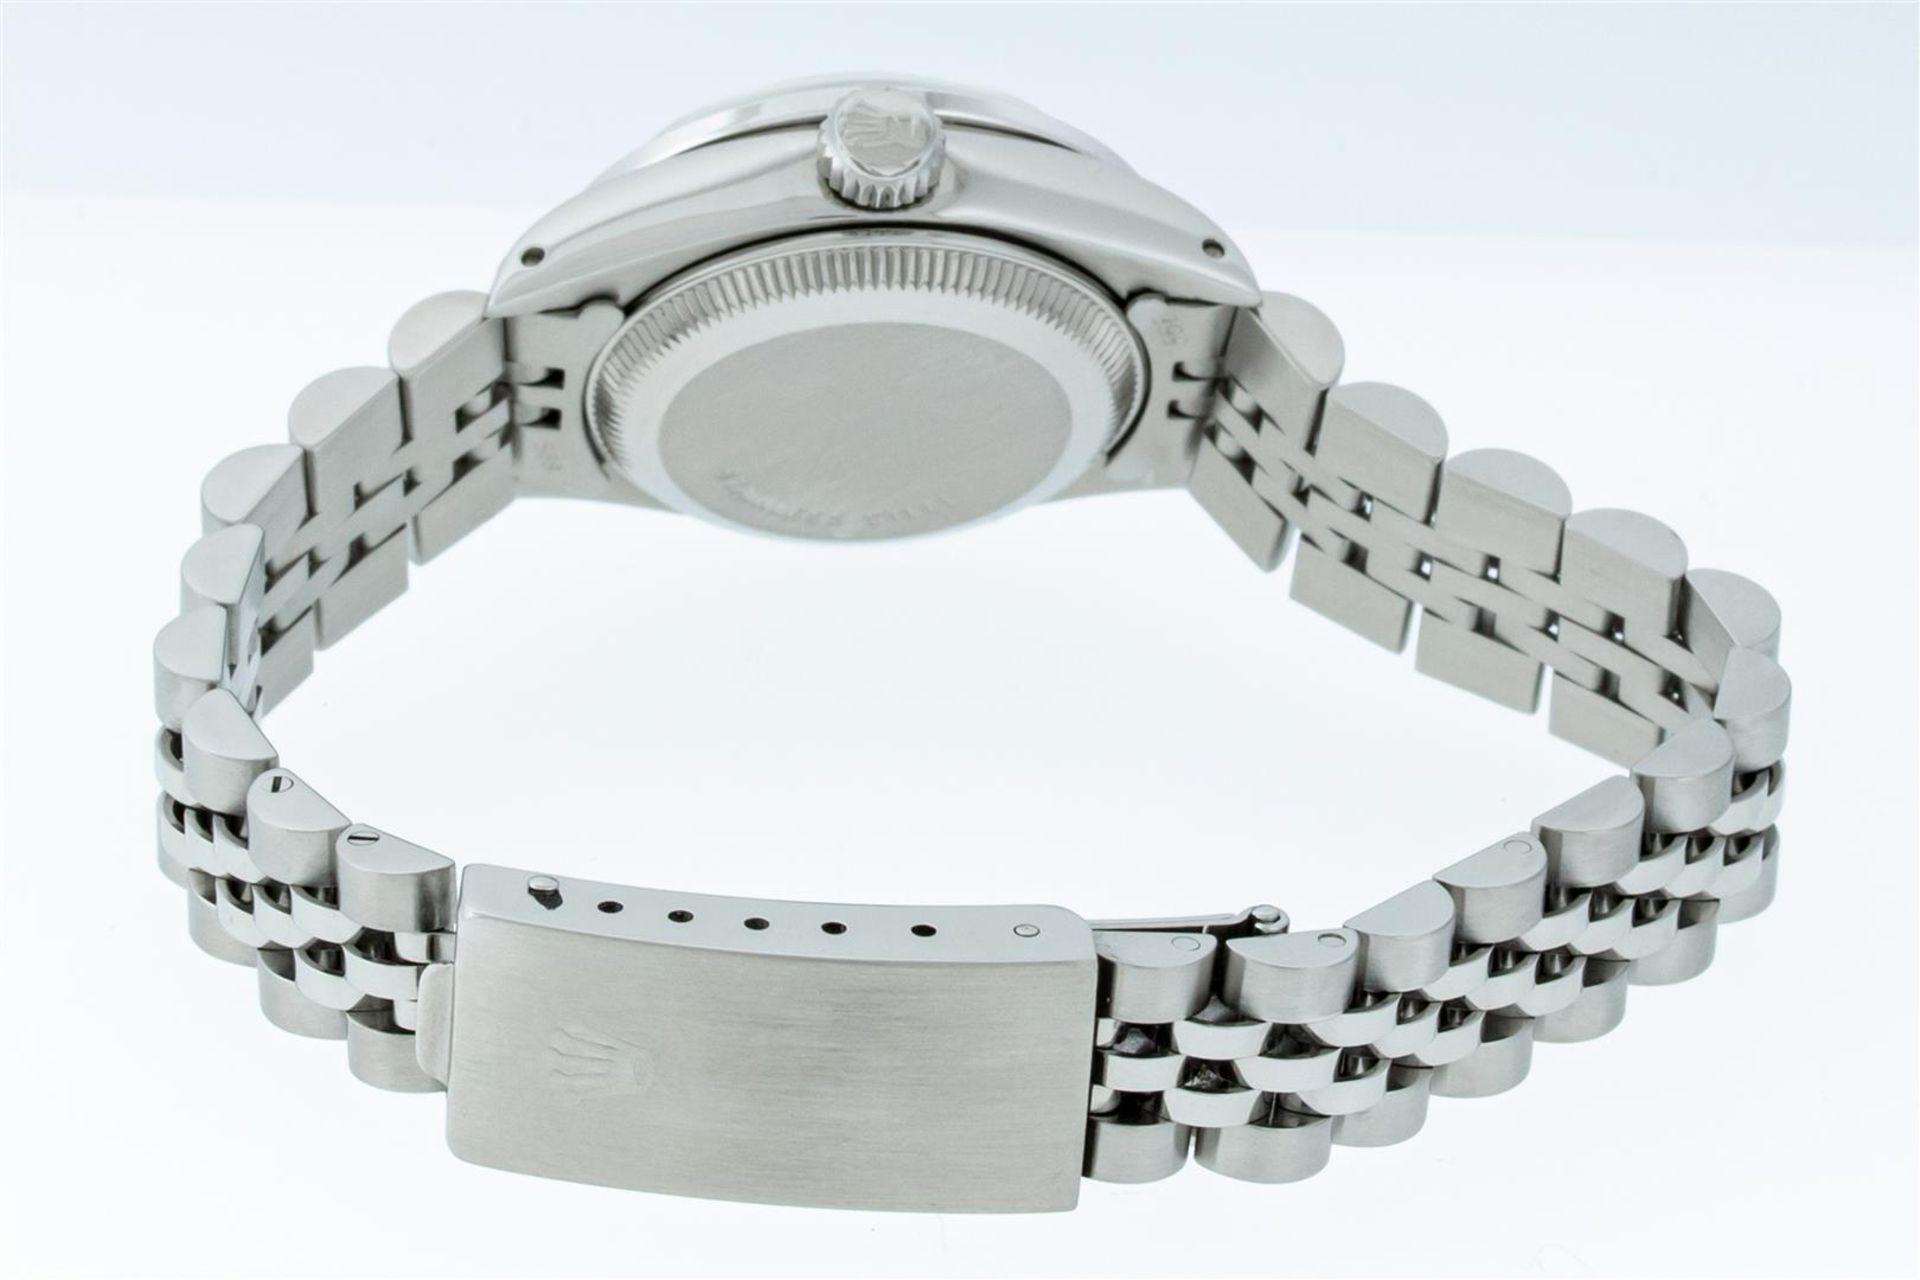 Rolex Ladies Stainless Steel Blue VVS Diamond & Sapphire Datejust Wristwatch - Image 8 of 9